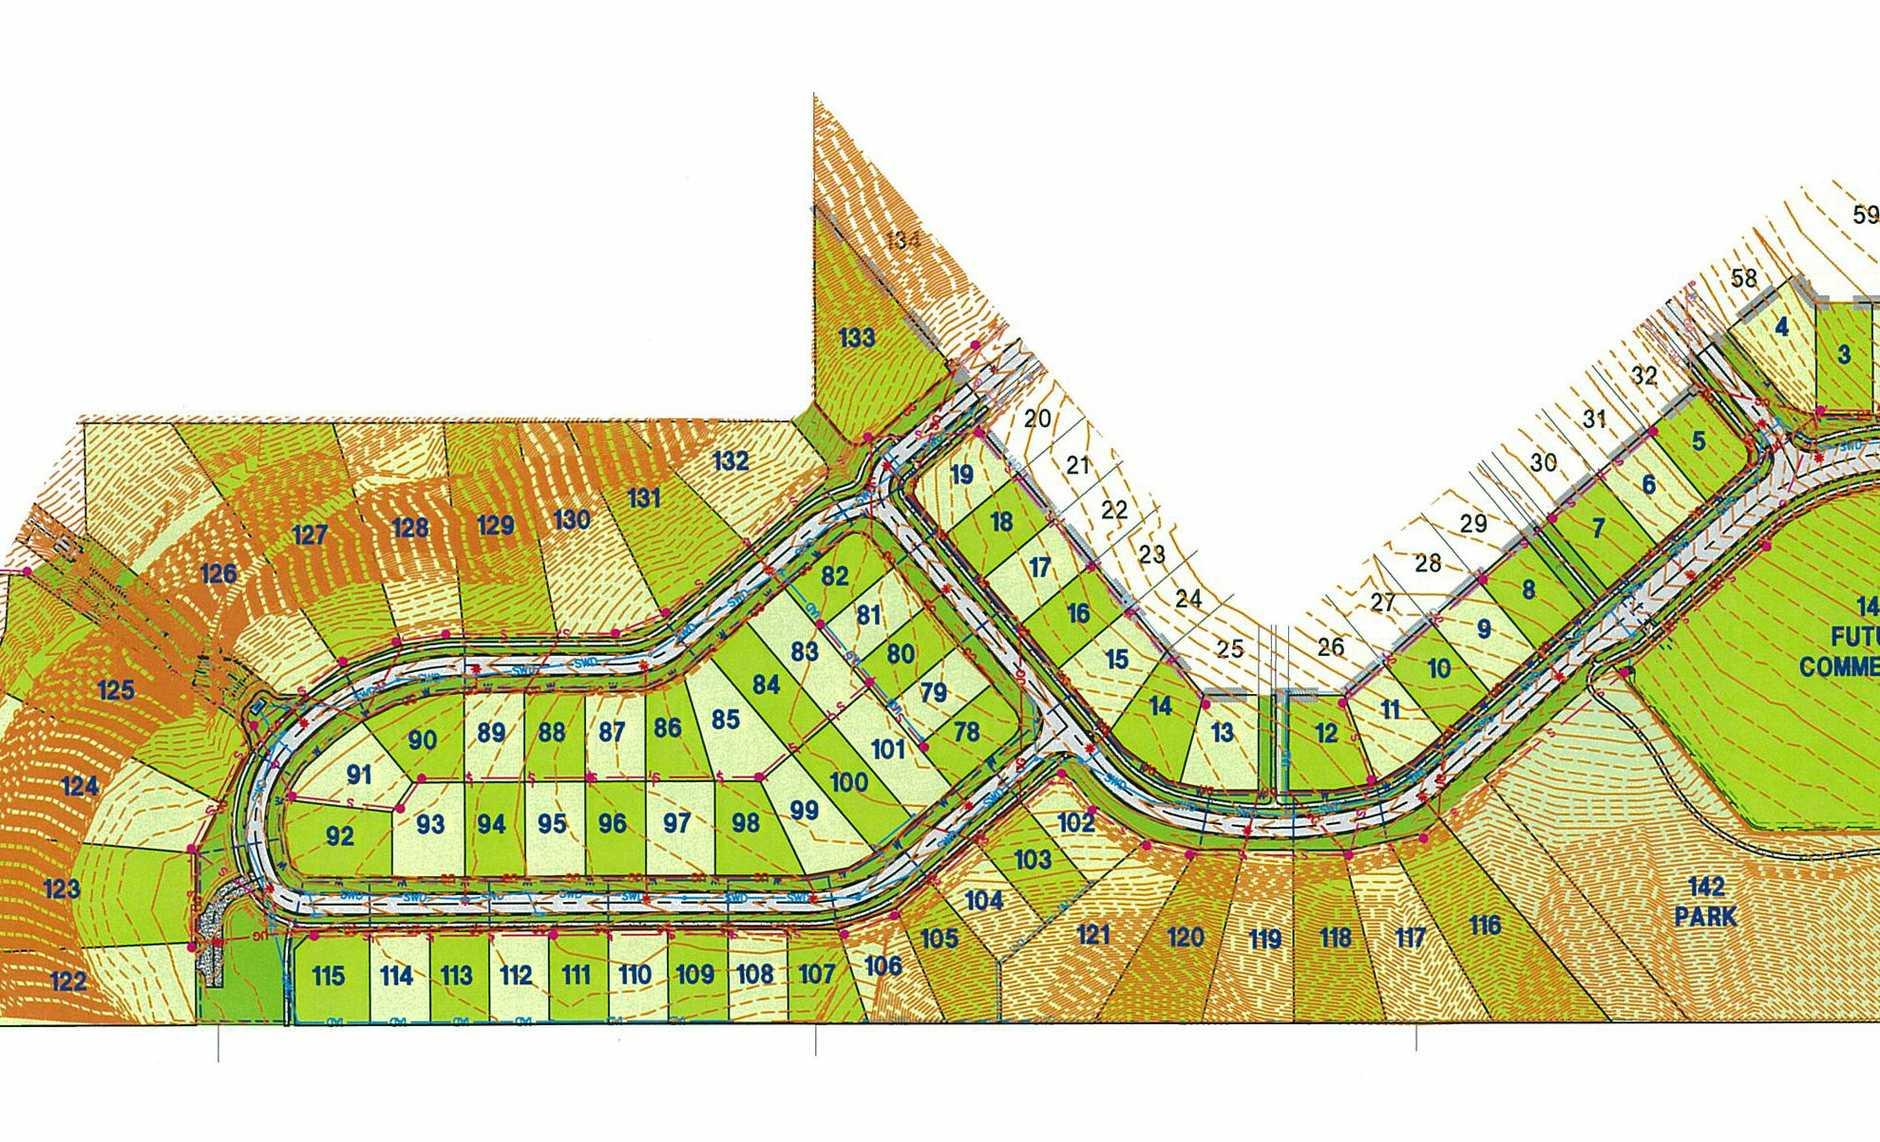 Contour maps of Sovereign Hill housing estate in Torrington, Toowoomba.